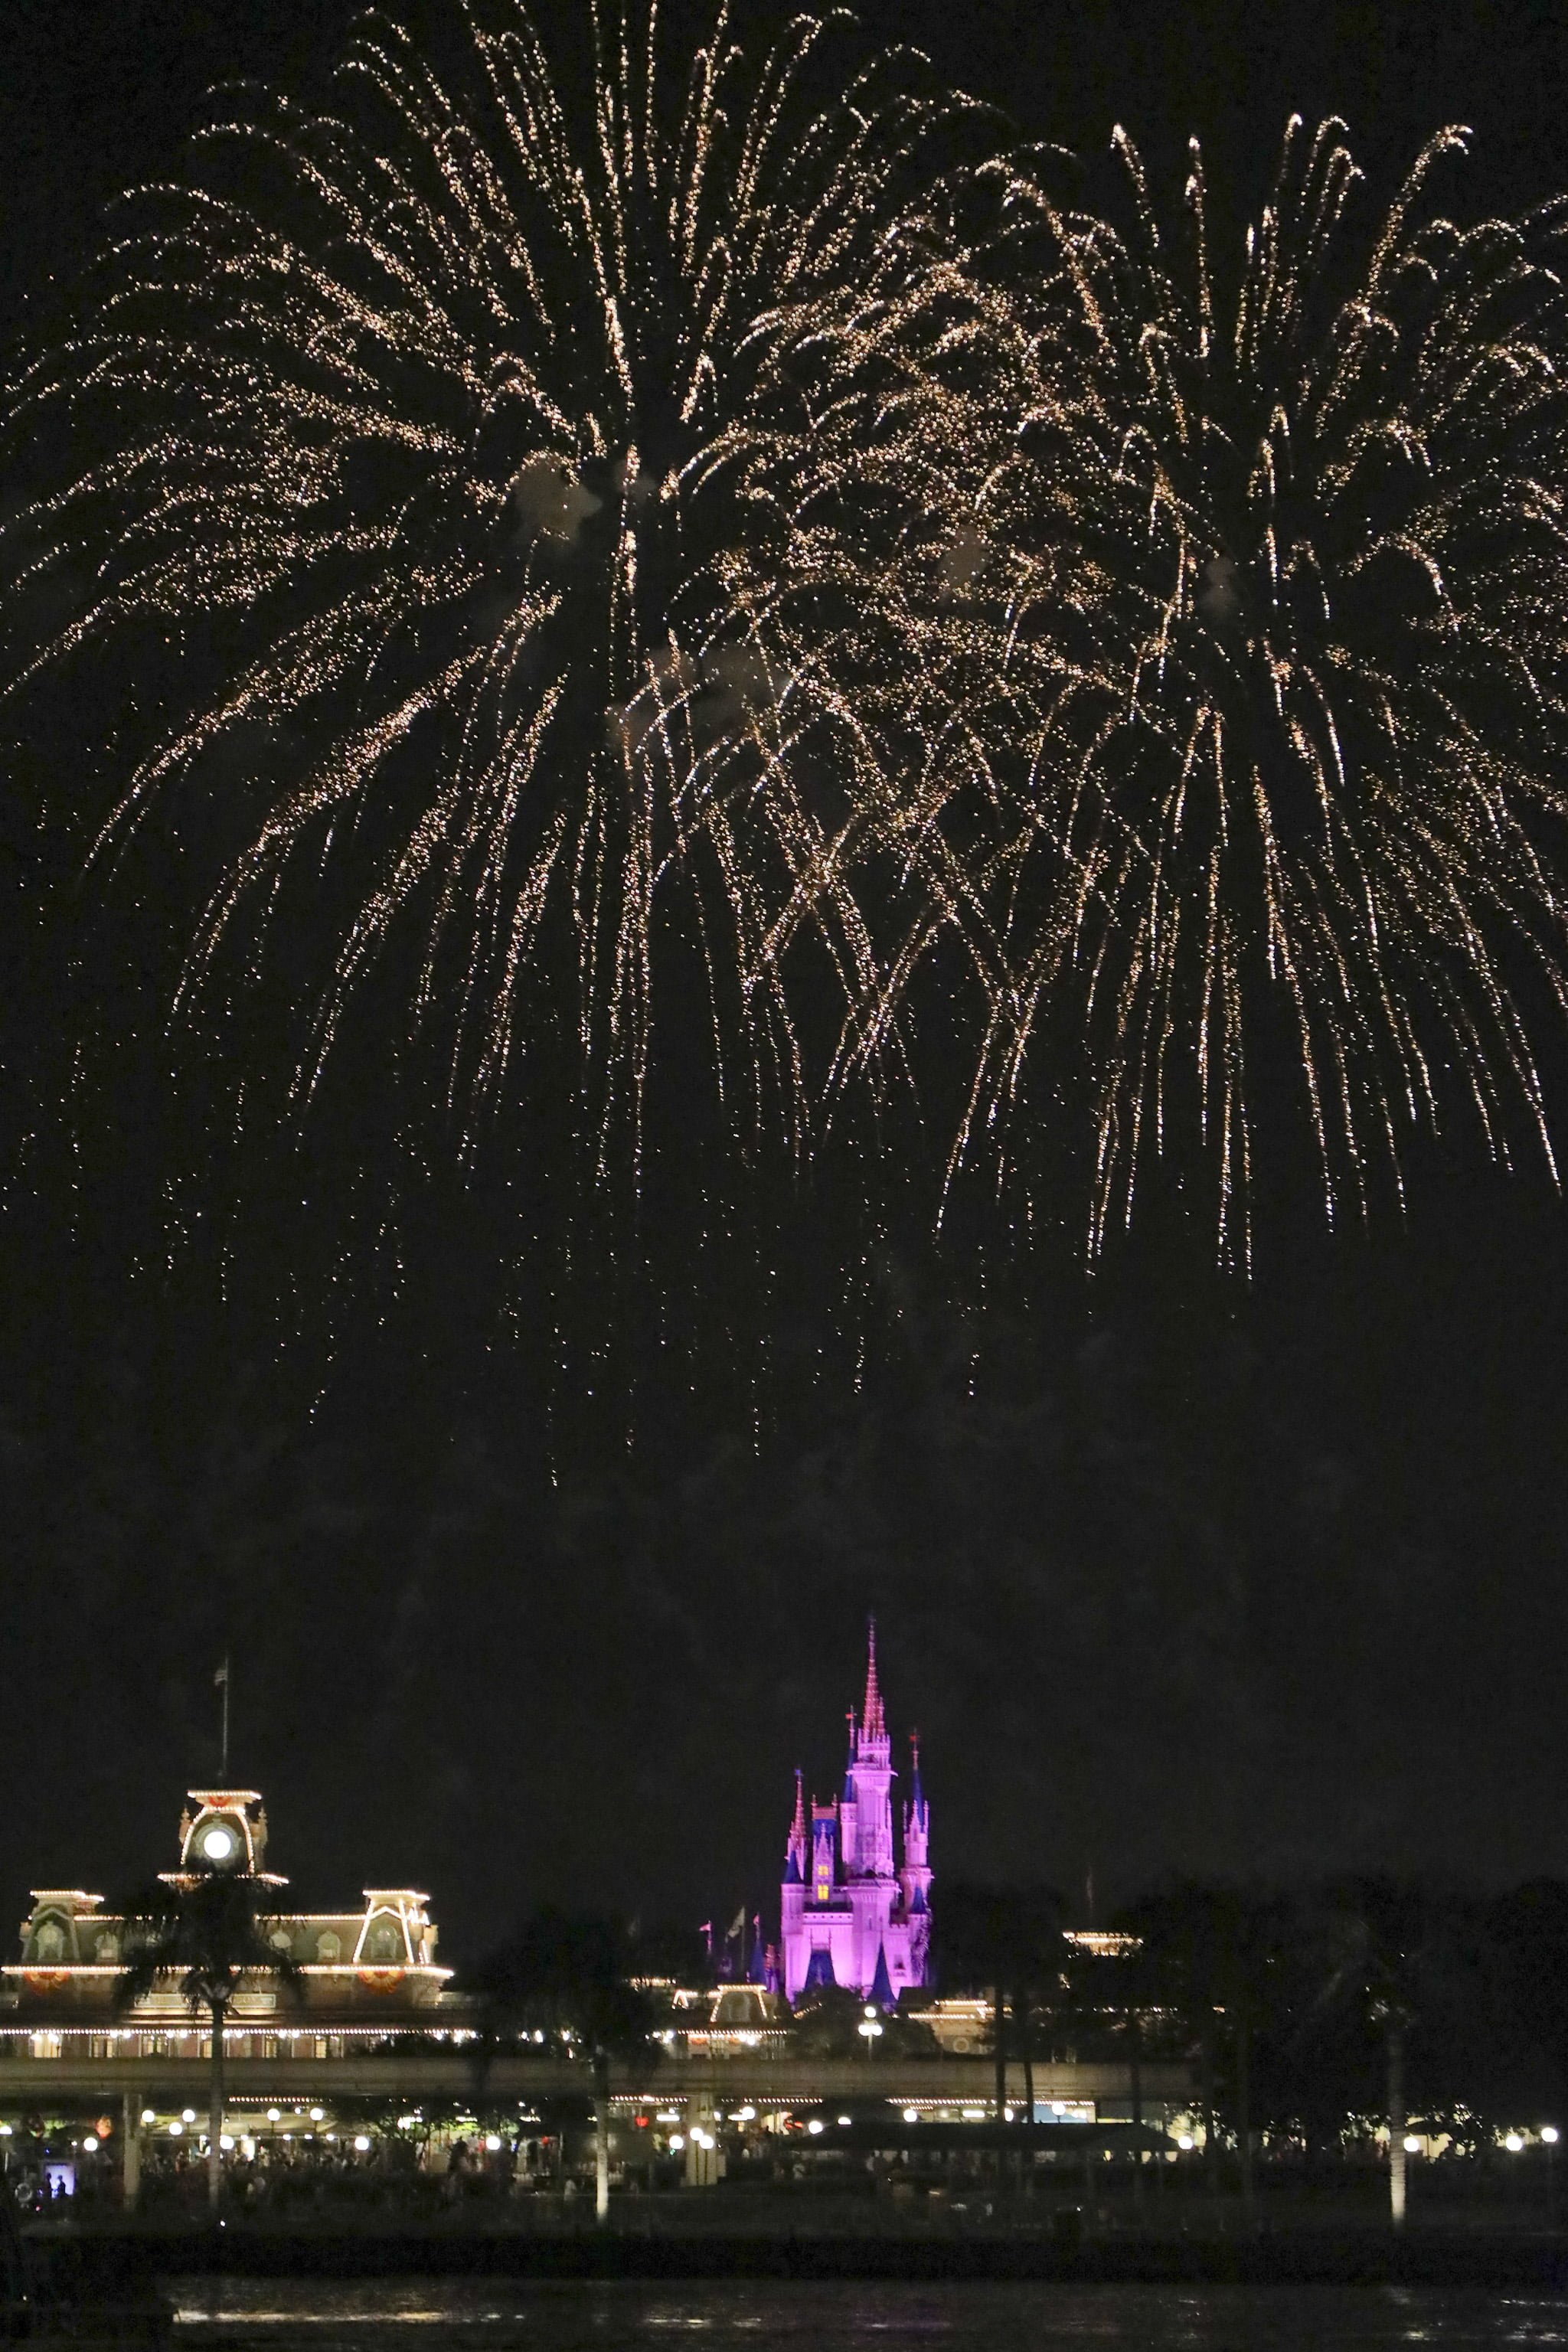 Walt Disney World - Magic Kingdom fireworks